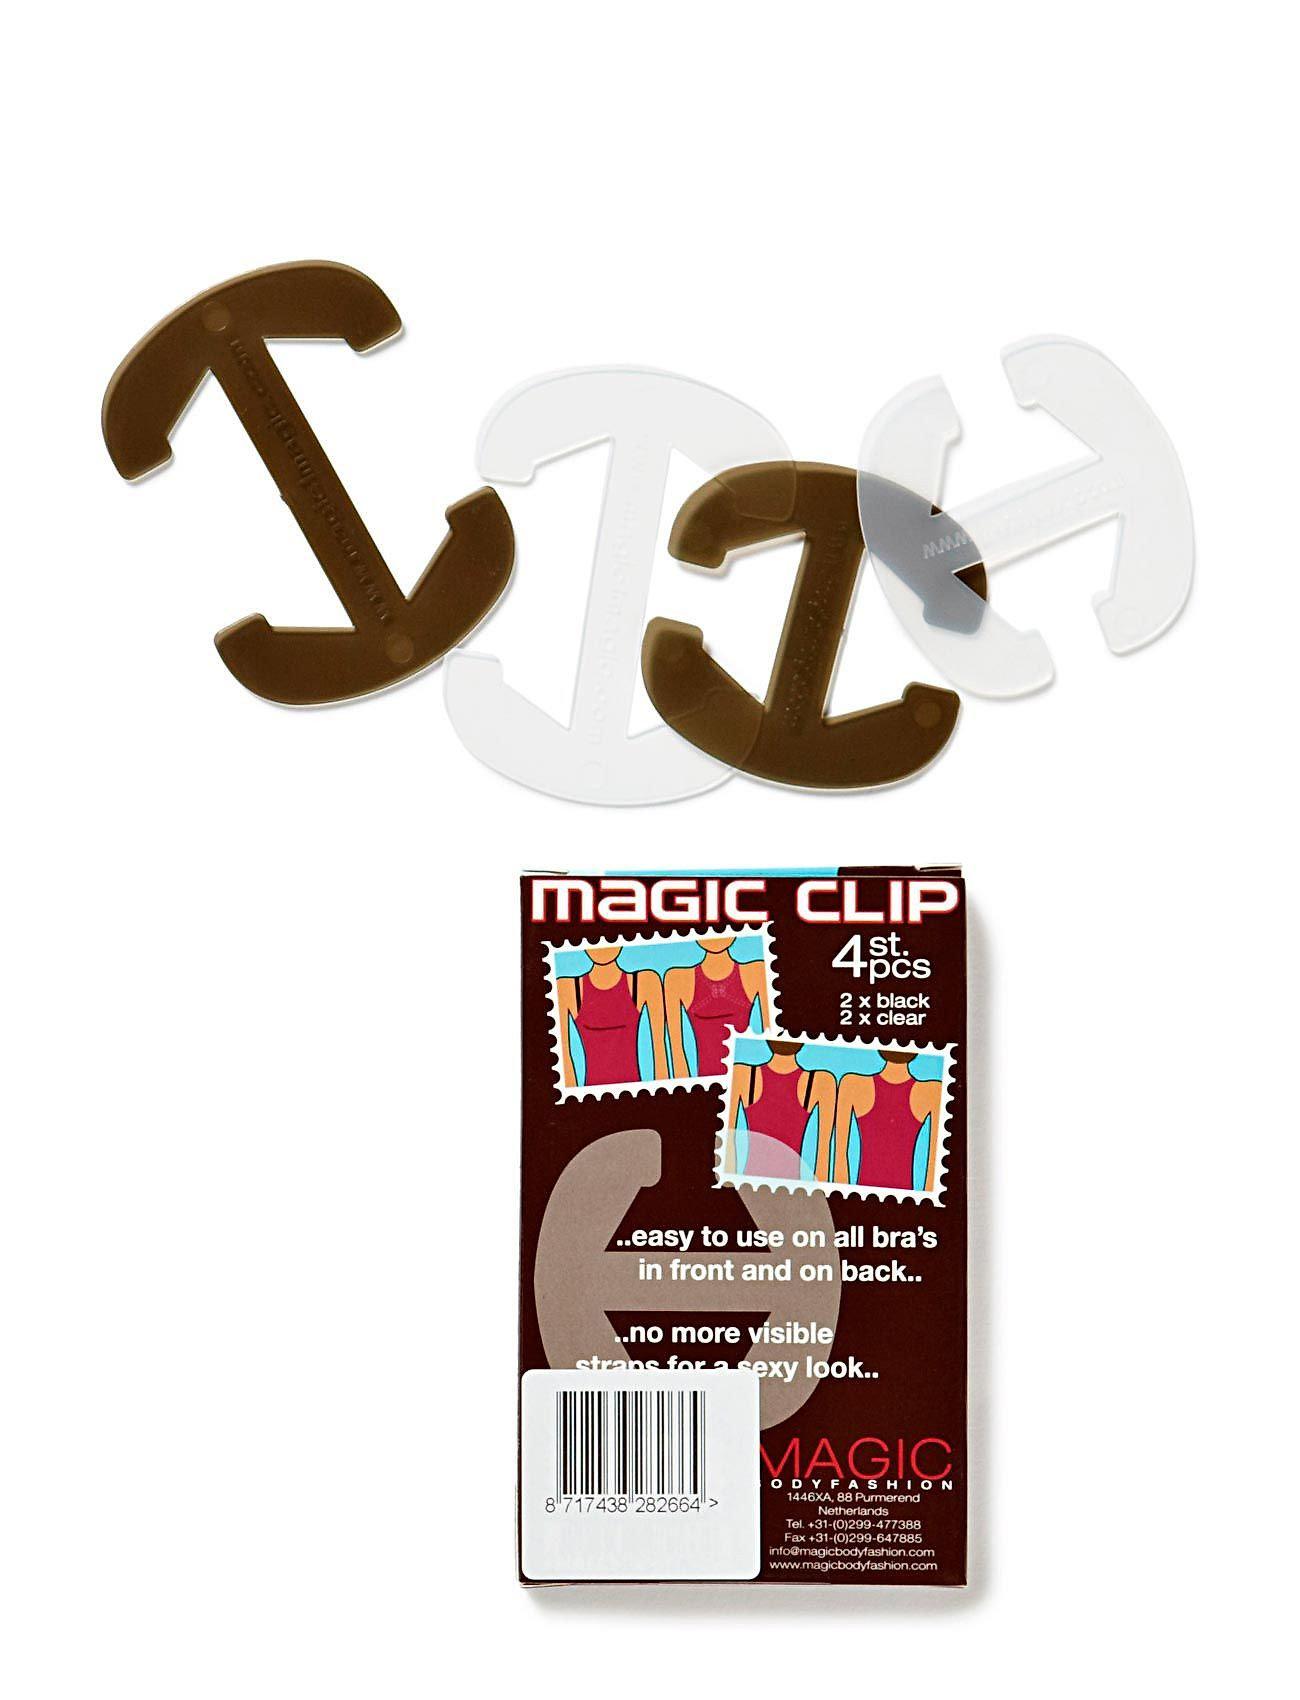 Magic Bodyfashion Magic Clip - CLEAR